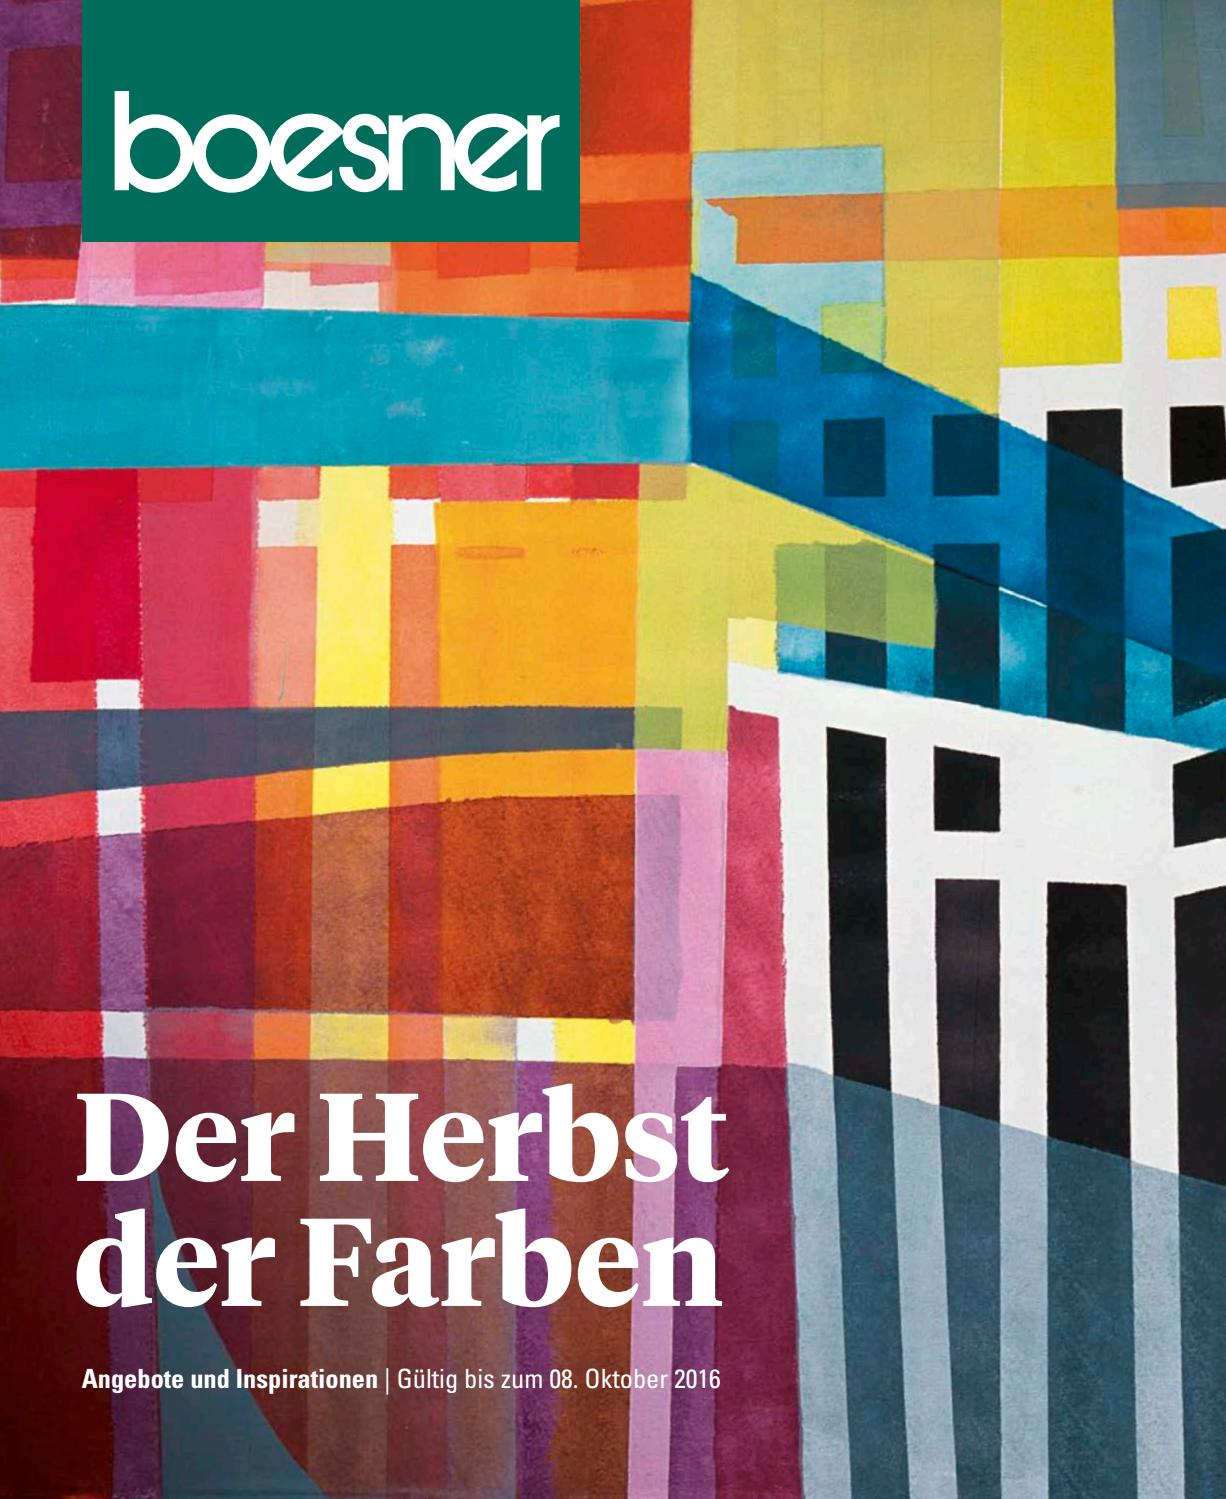 Herbstmailing de by boesner - issuu